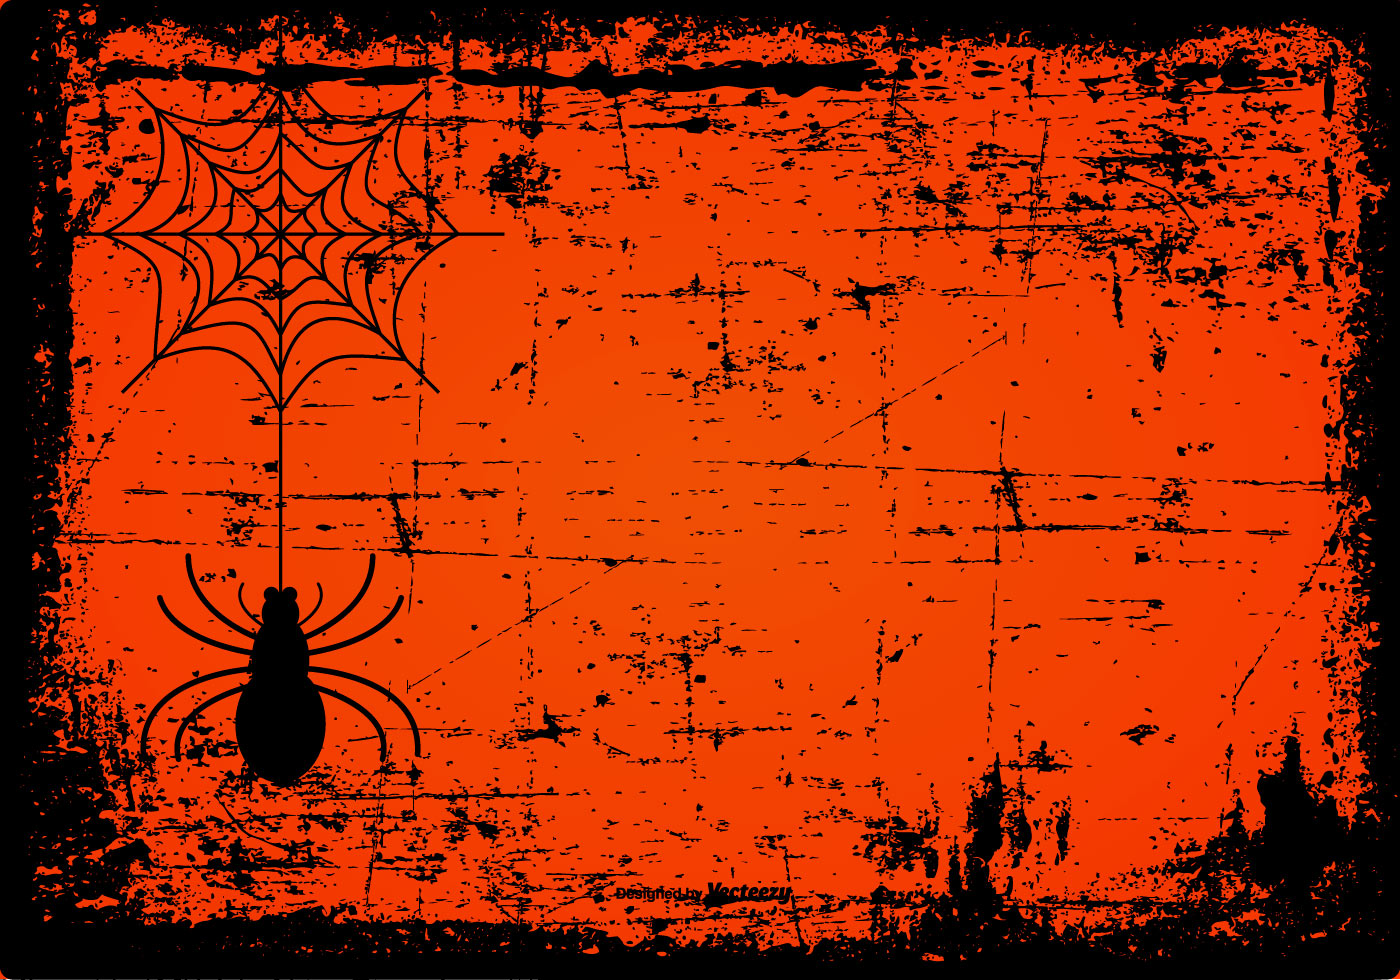 Free Fall Pumpkin Wallpaper Grunge Spooky Halloween Background Download Free Vector